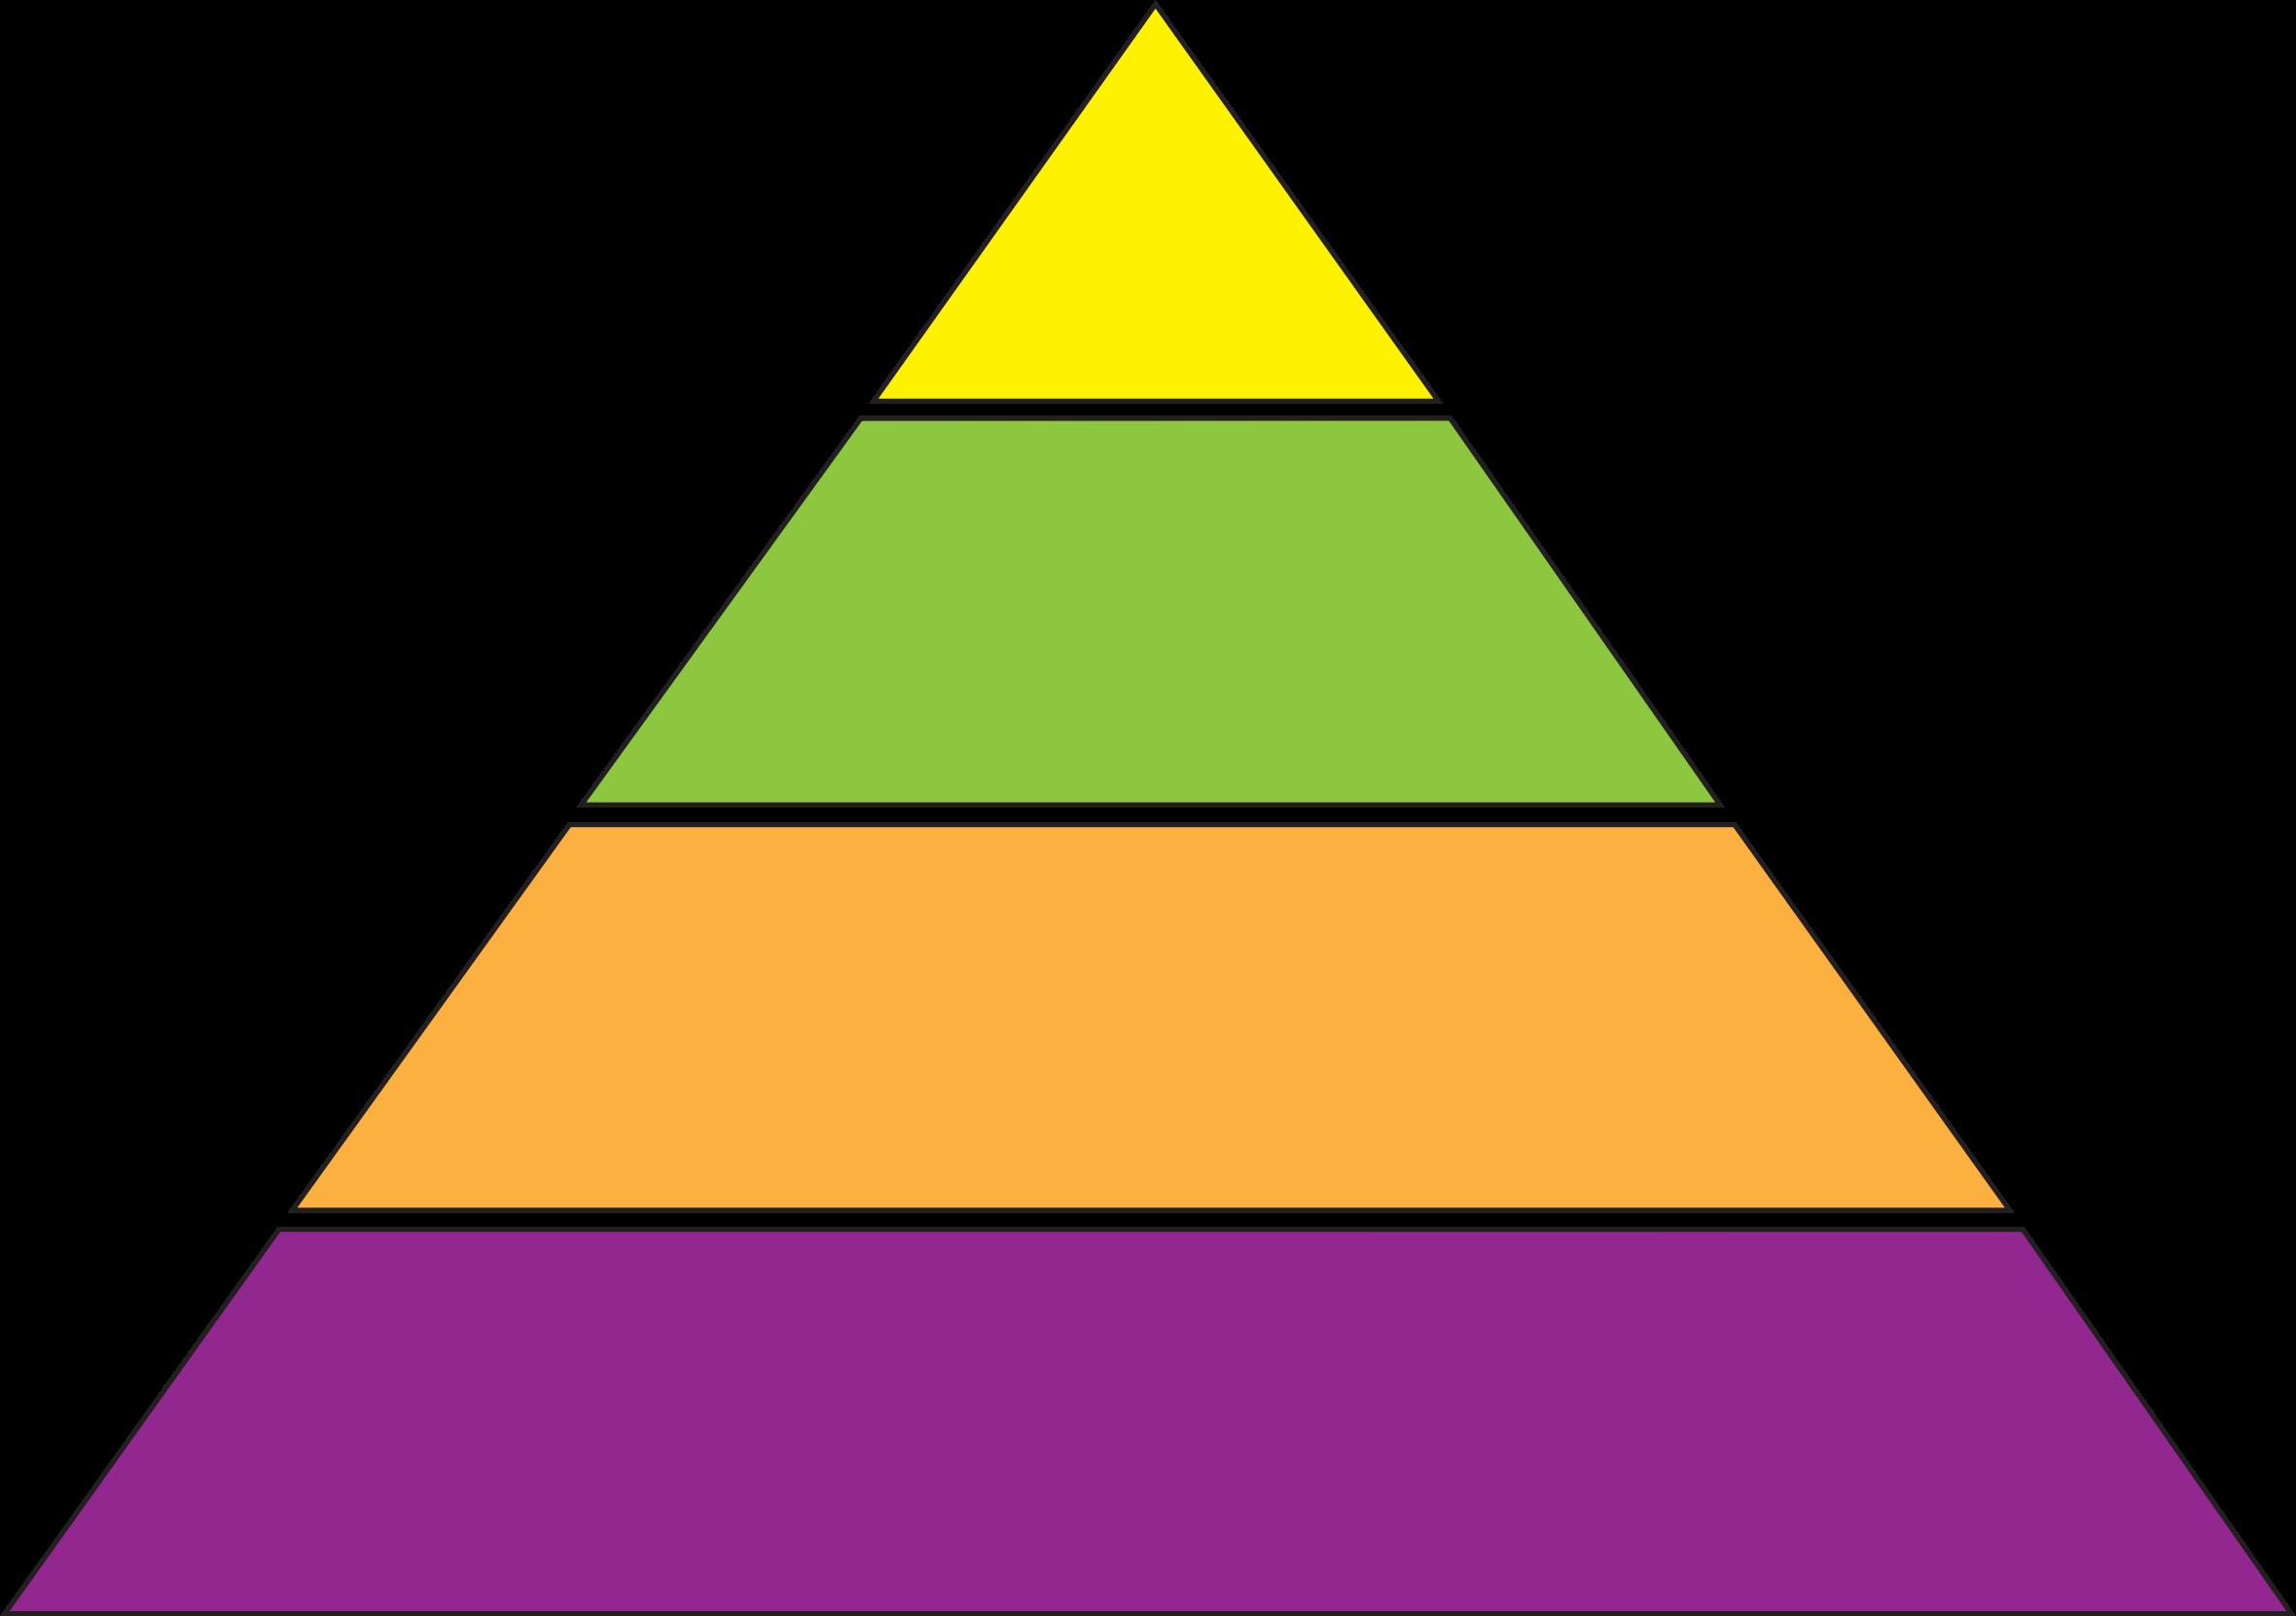 Pyramid Cliparts. Pyramid Cliparts. Food-Pyramid cliparts. Pyramid cliparts. Food Pyramid Clip Art-11